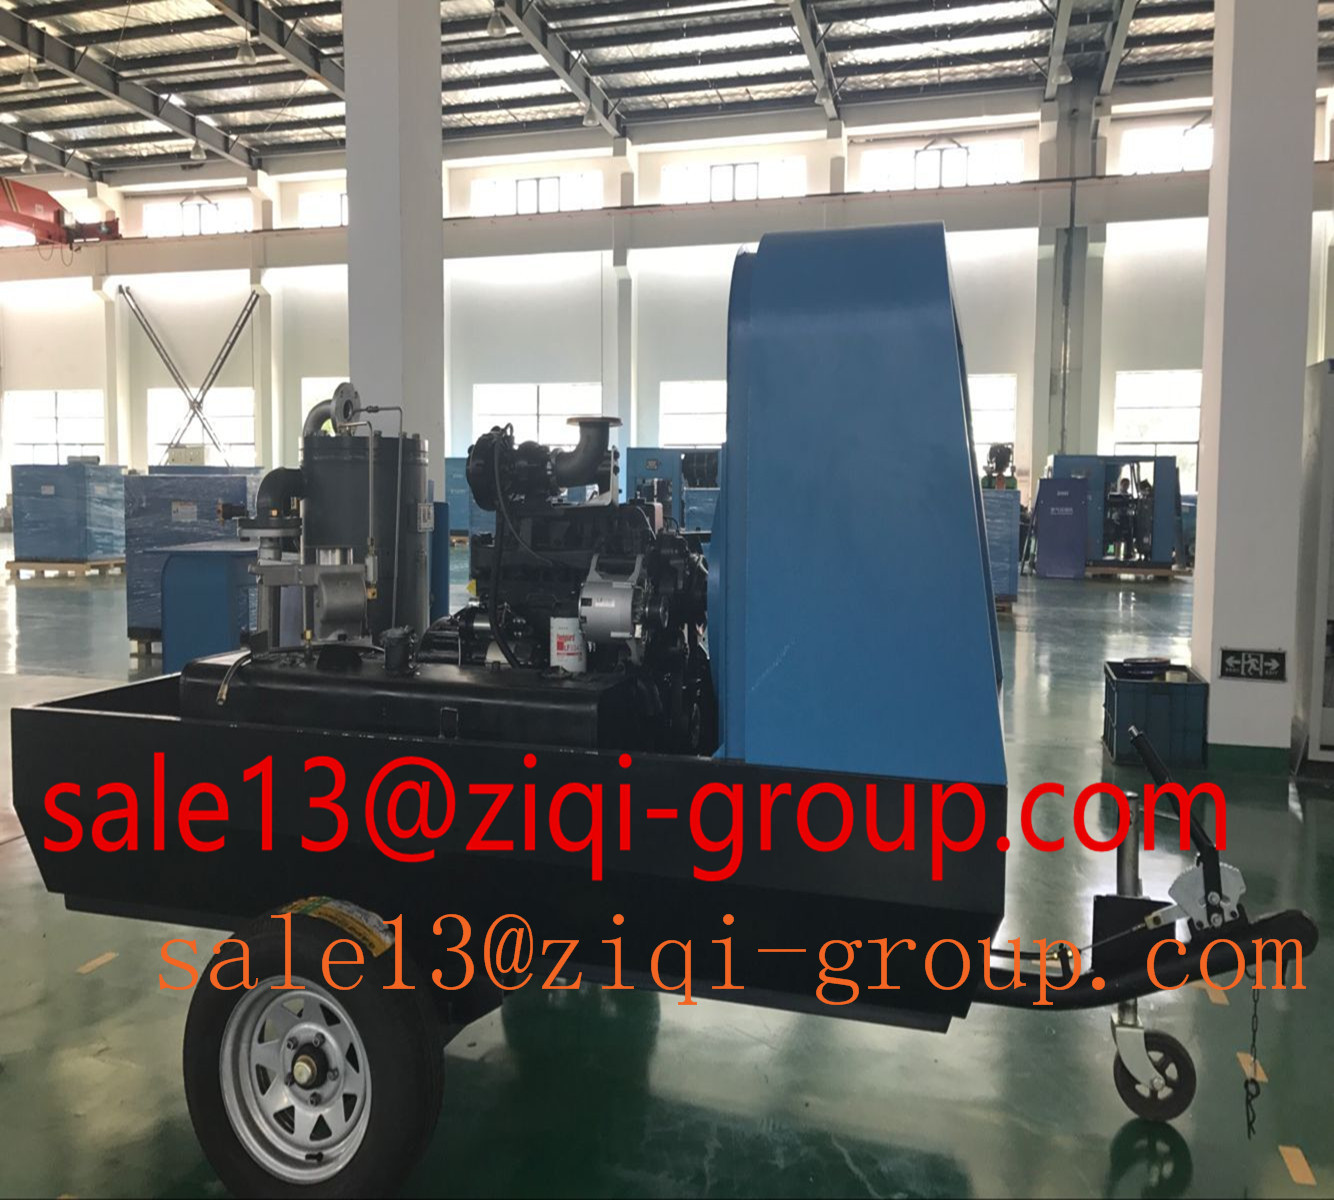 Portable Diesel Screw Air Compressor 22KW-336KW Diesel Portable Screw Air Compressor